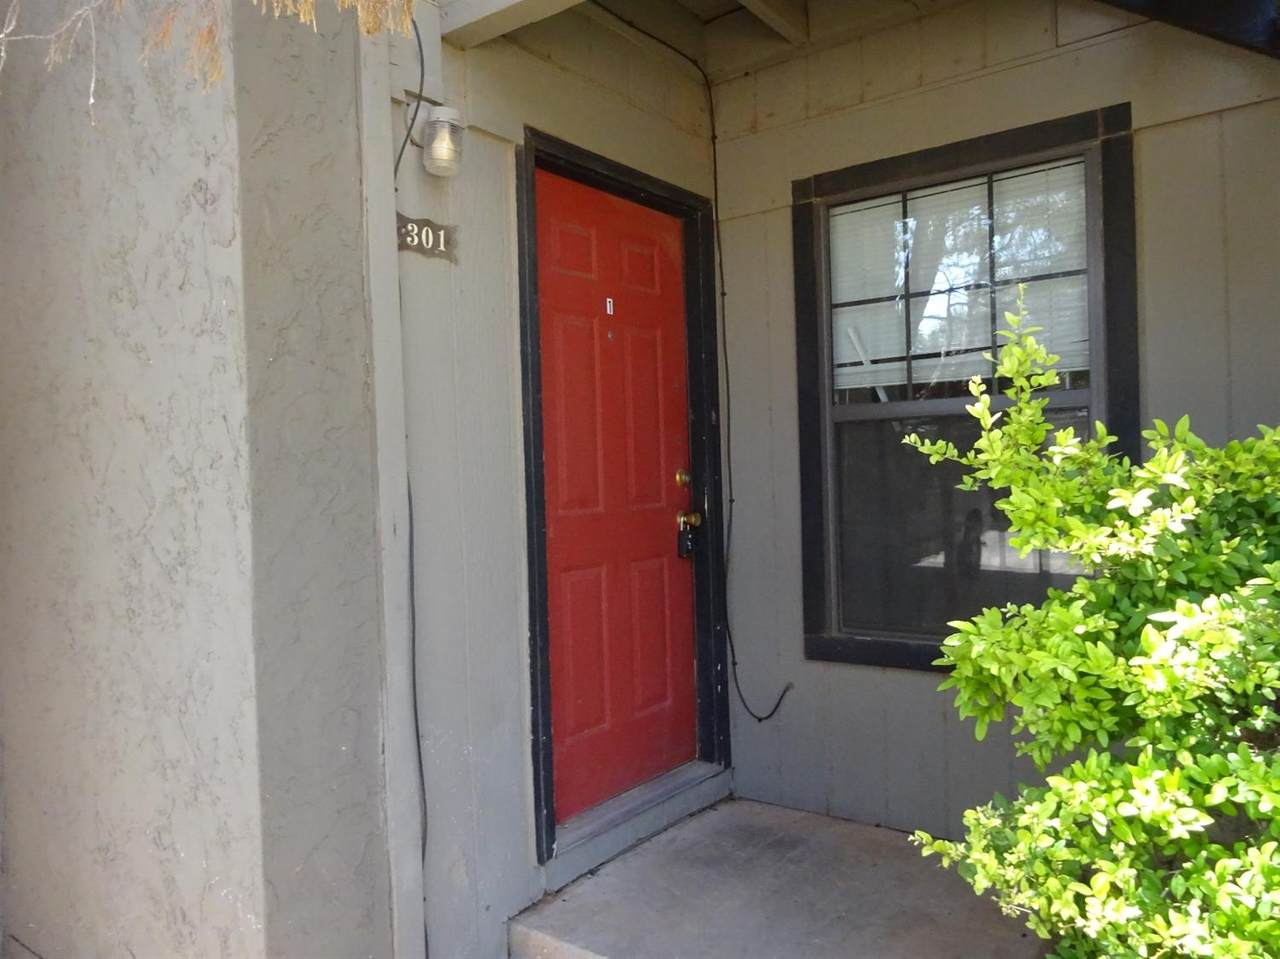 7408-301 Ave X - Photo 1